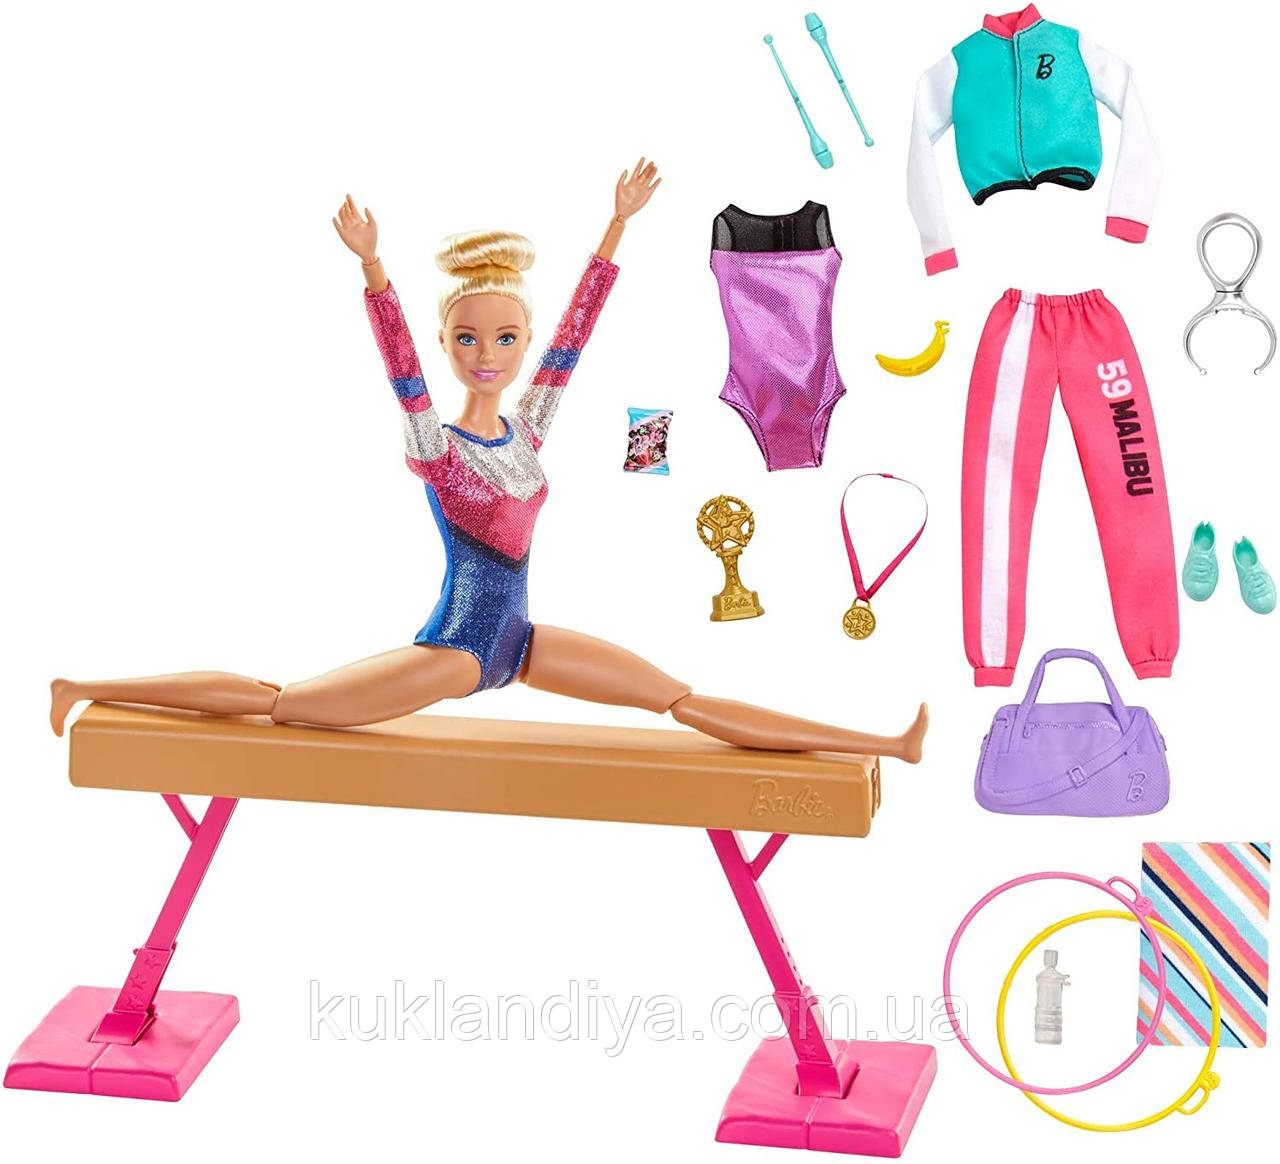 Лялька Барбі Гімнастка з аксесуарами Barbie Gymnastics Doll and Playset (GJM72)